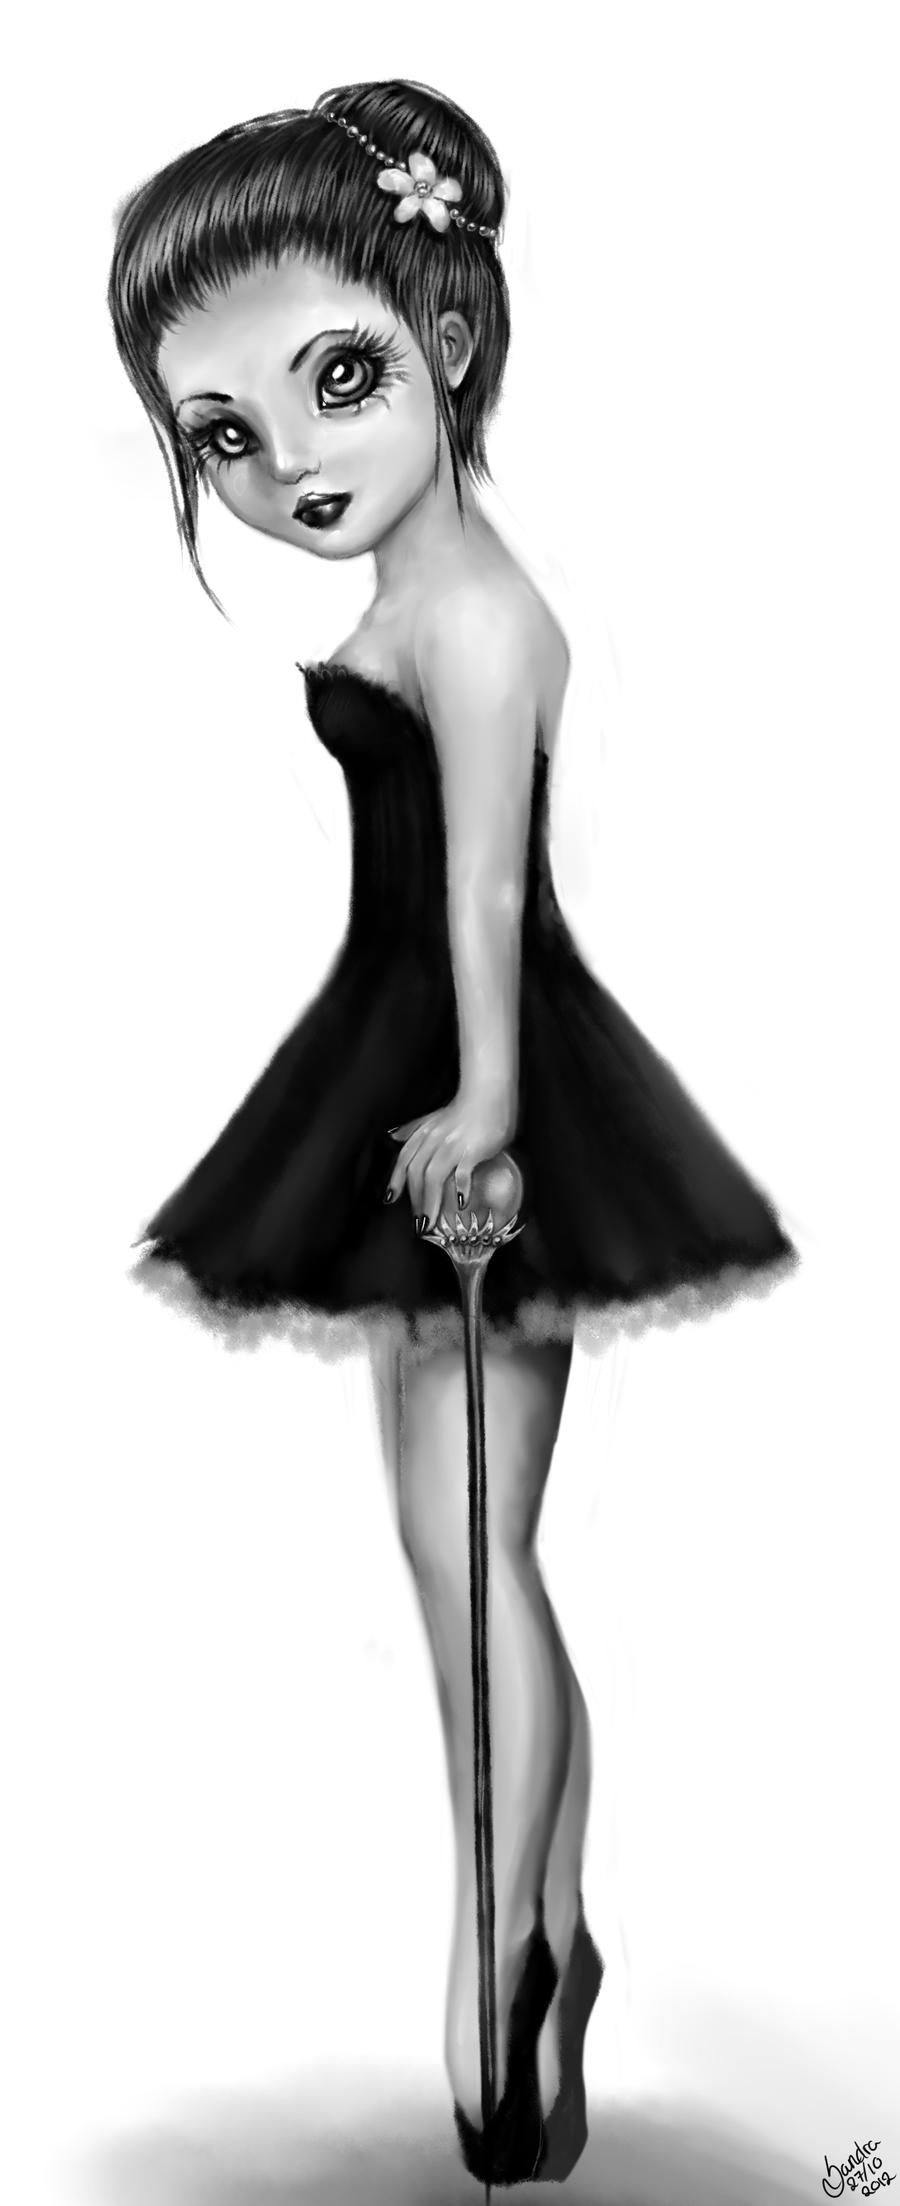 Drawn ballerine creepy Creepy 71125 Doll Drawing Drawing